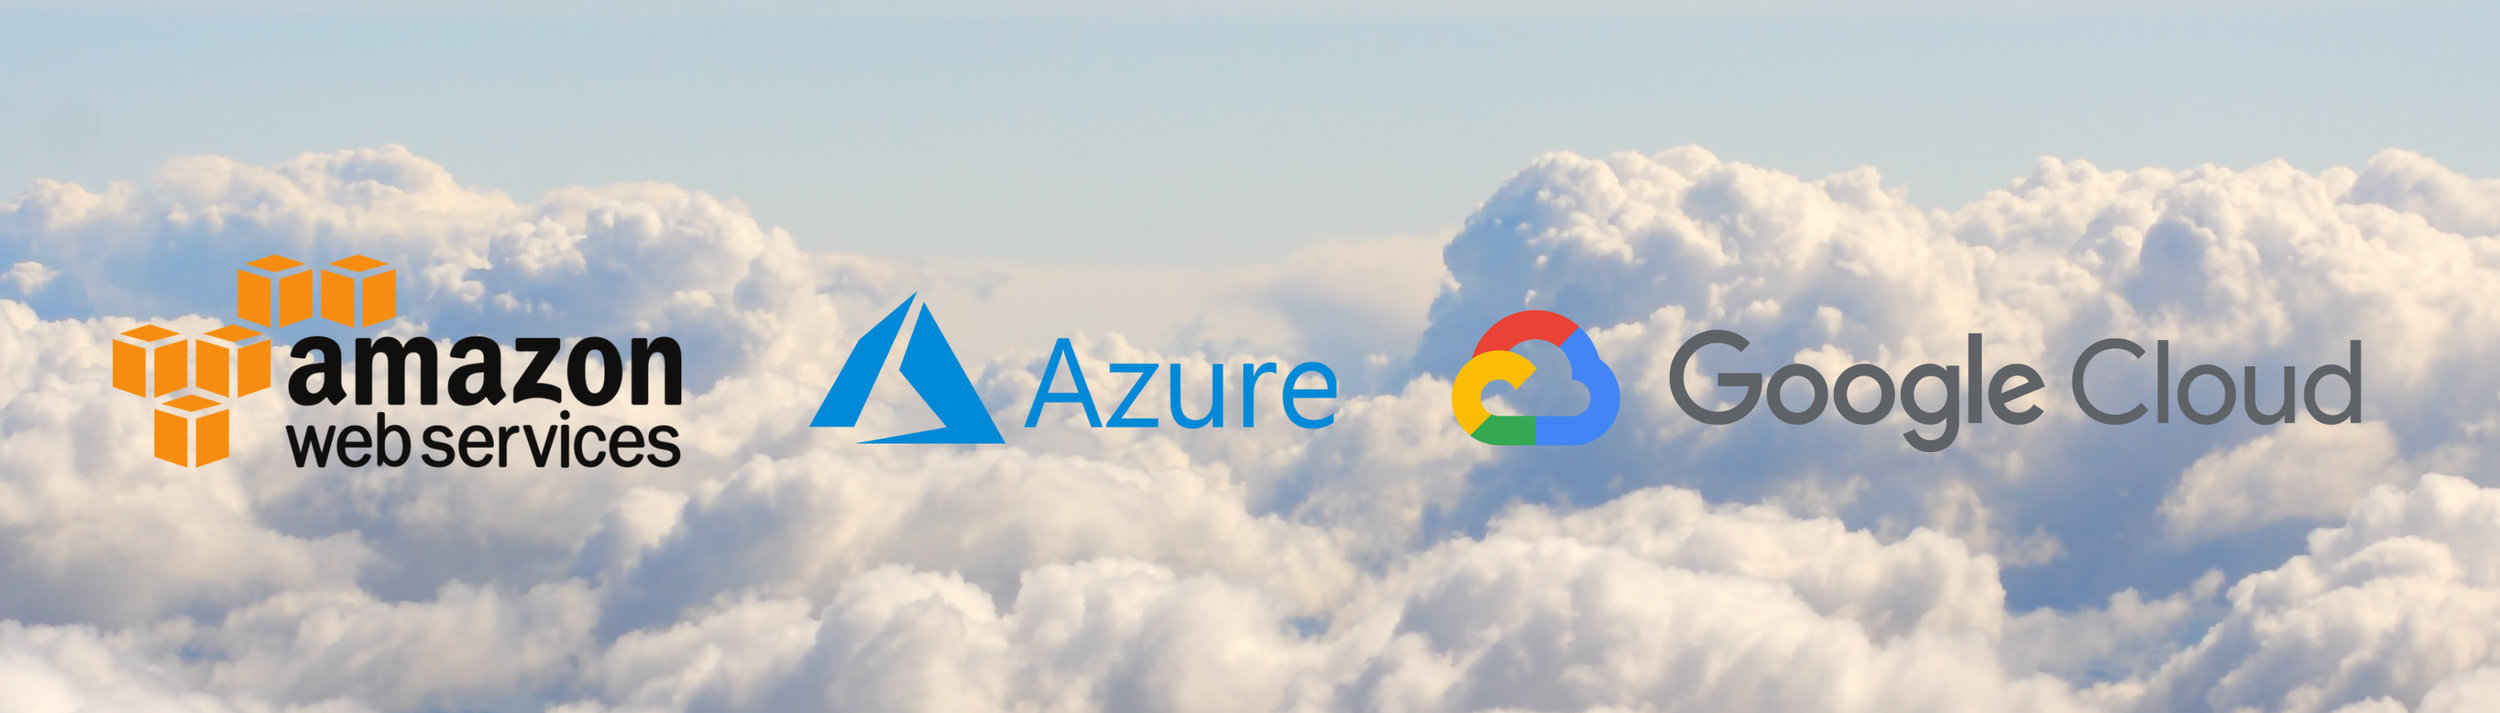 AWS-Azure-GCloud.jpg